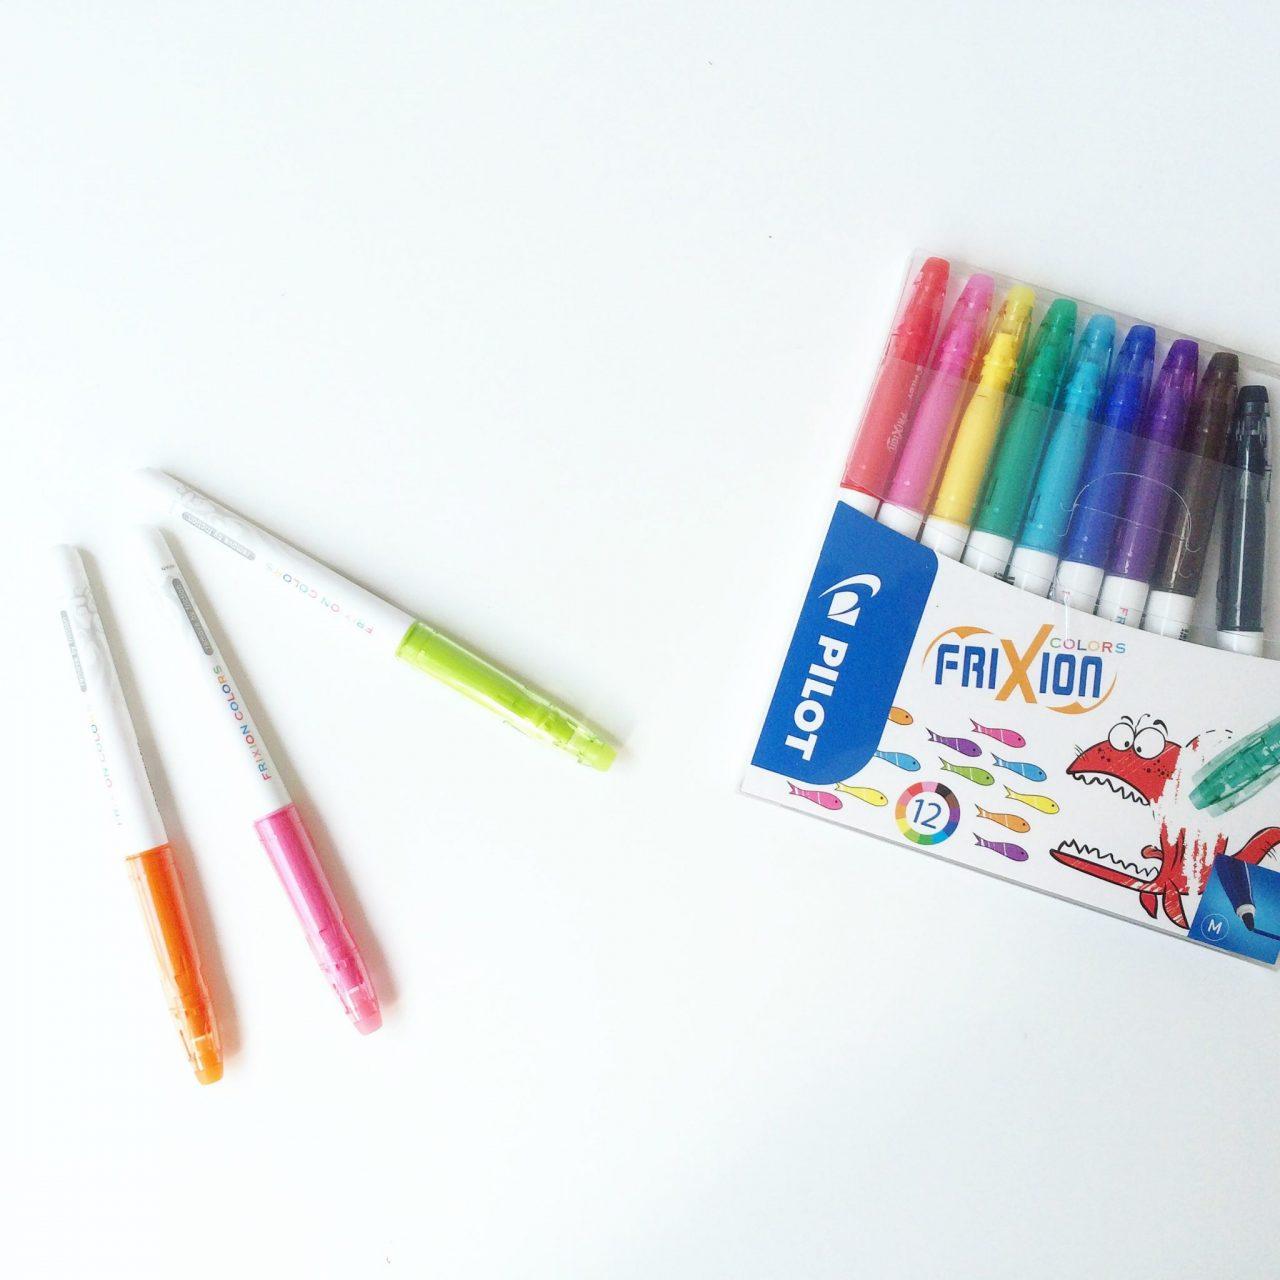 welche filzstifte sind f r kinder geeignet frixion colors im test sarahplusdrei. Black Bedroom Furniture Sets. Home Design Ideas